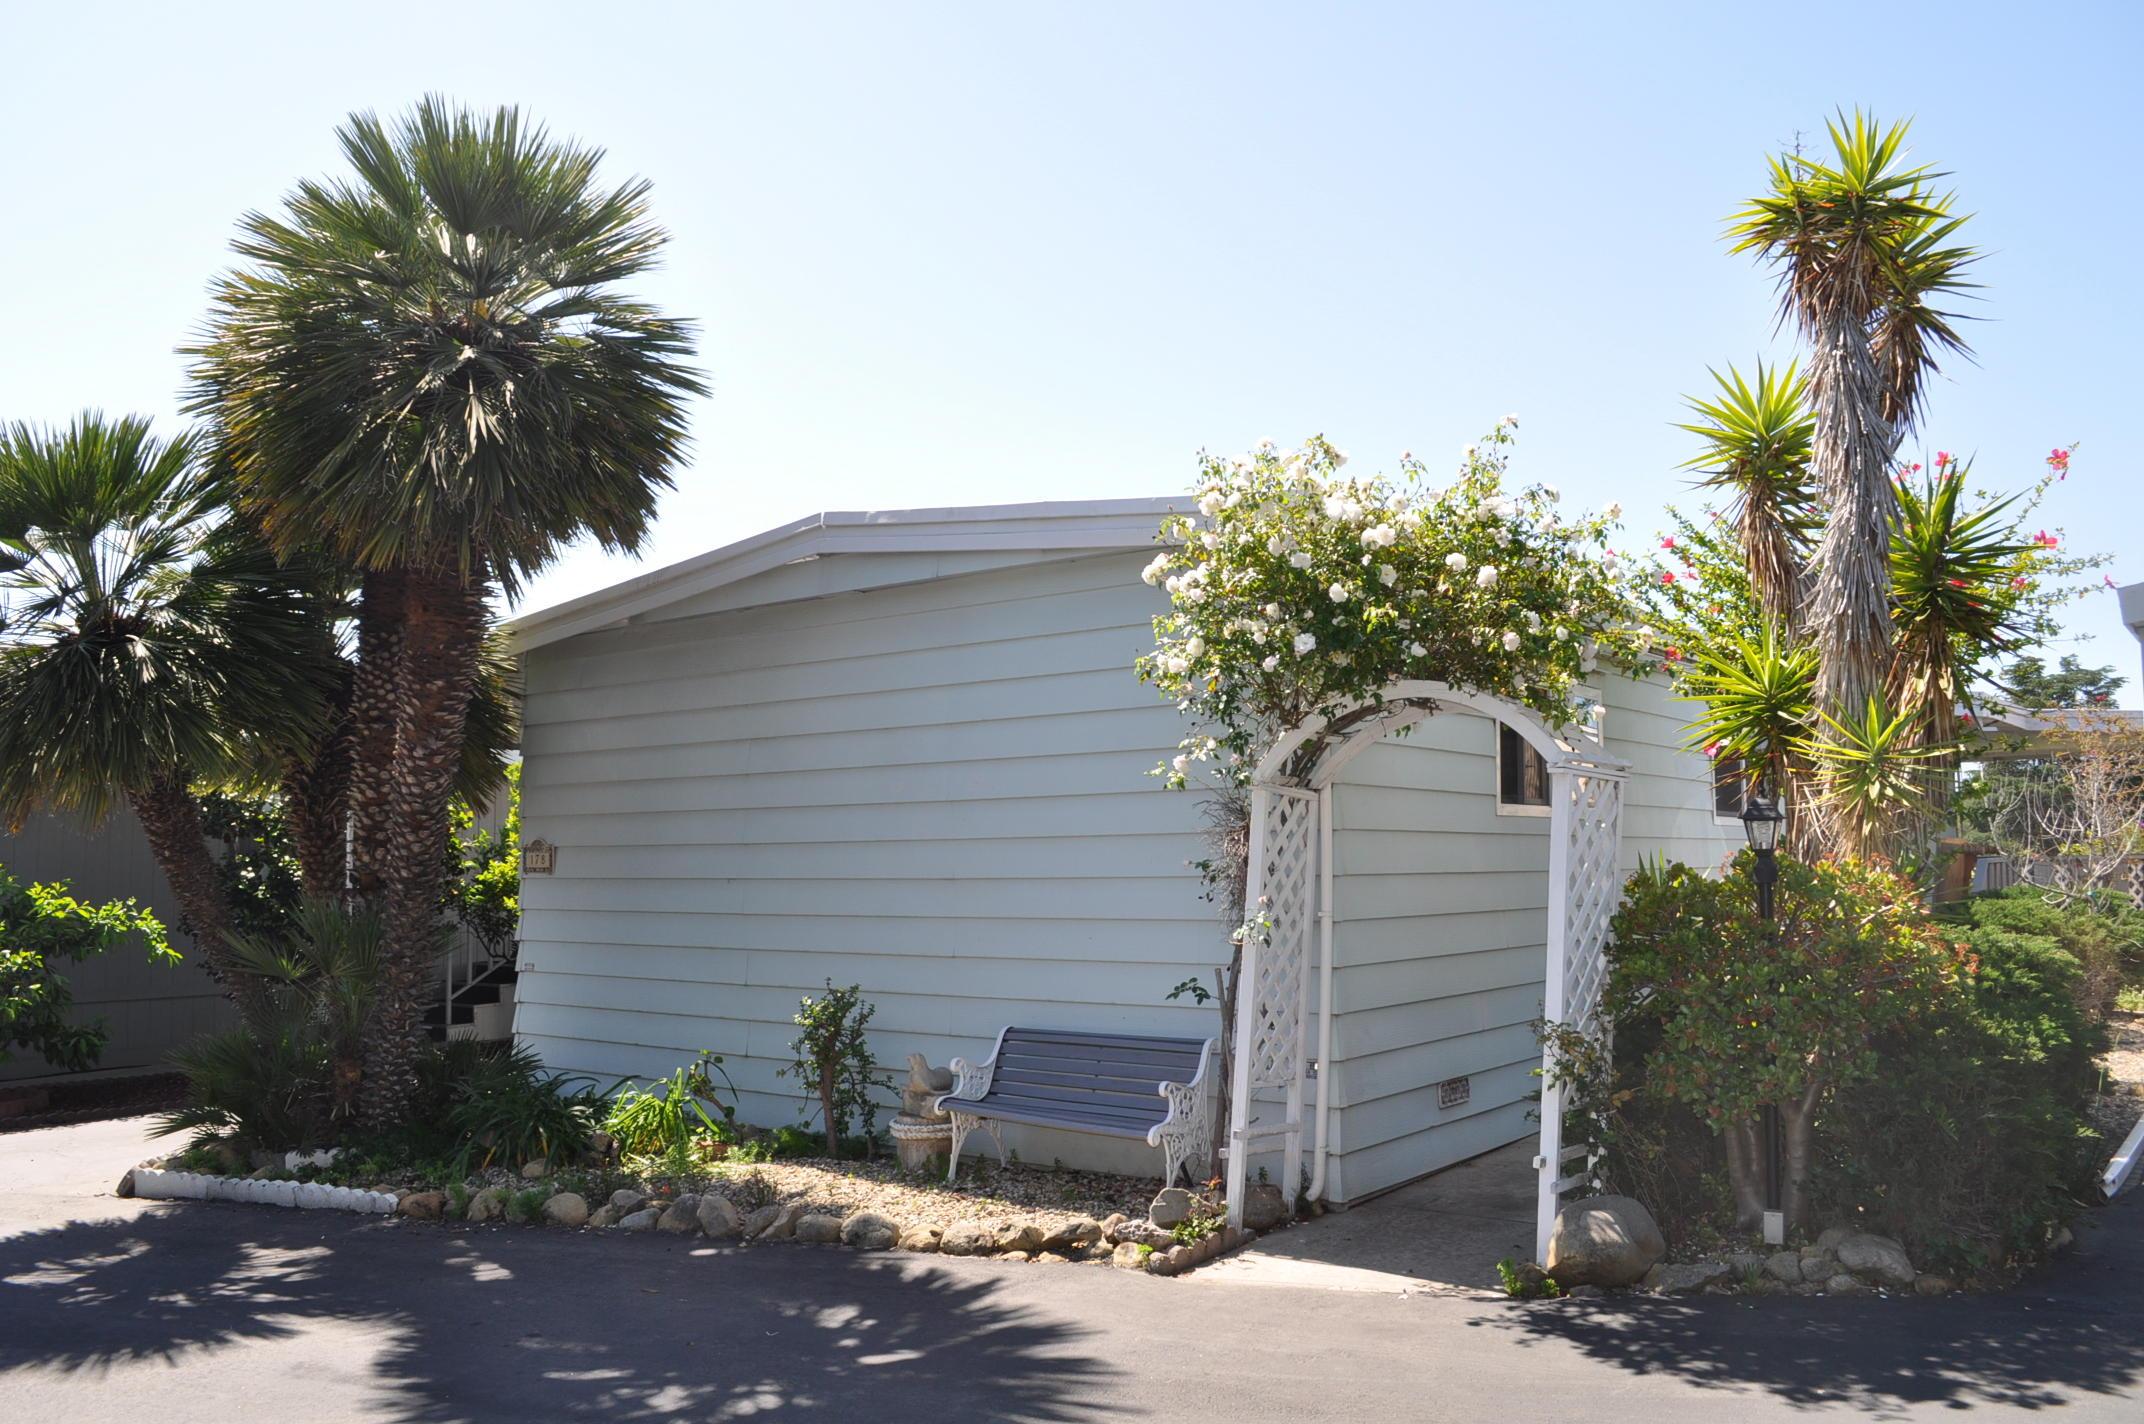 Property photo for 333 Old Mill Rd #178 Santa Barbara, California 93110 - 16-1258